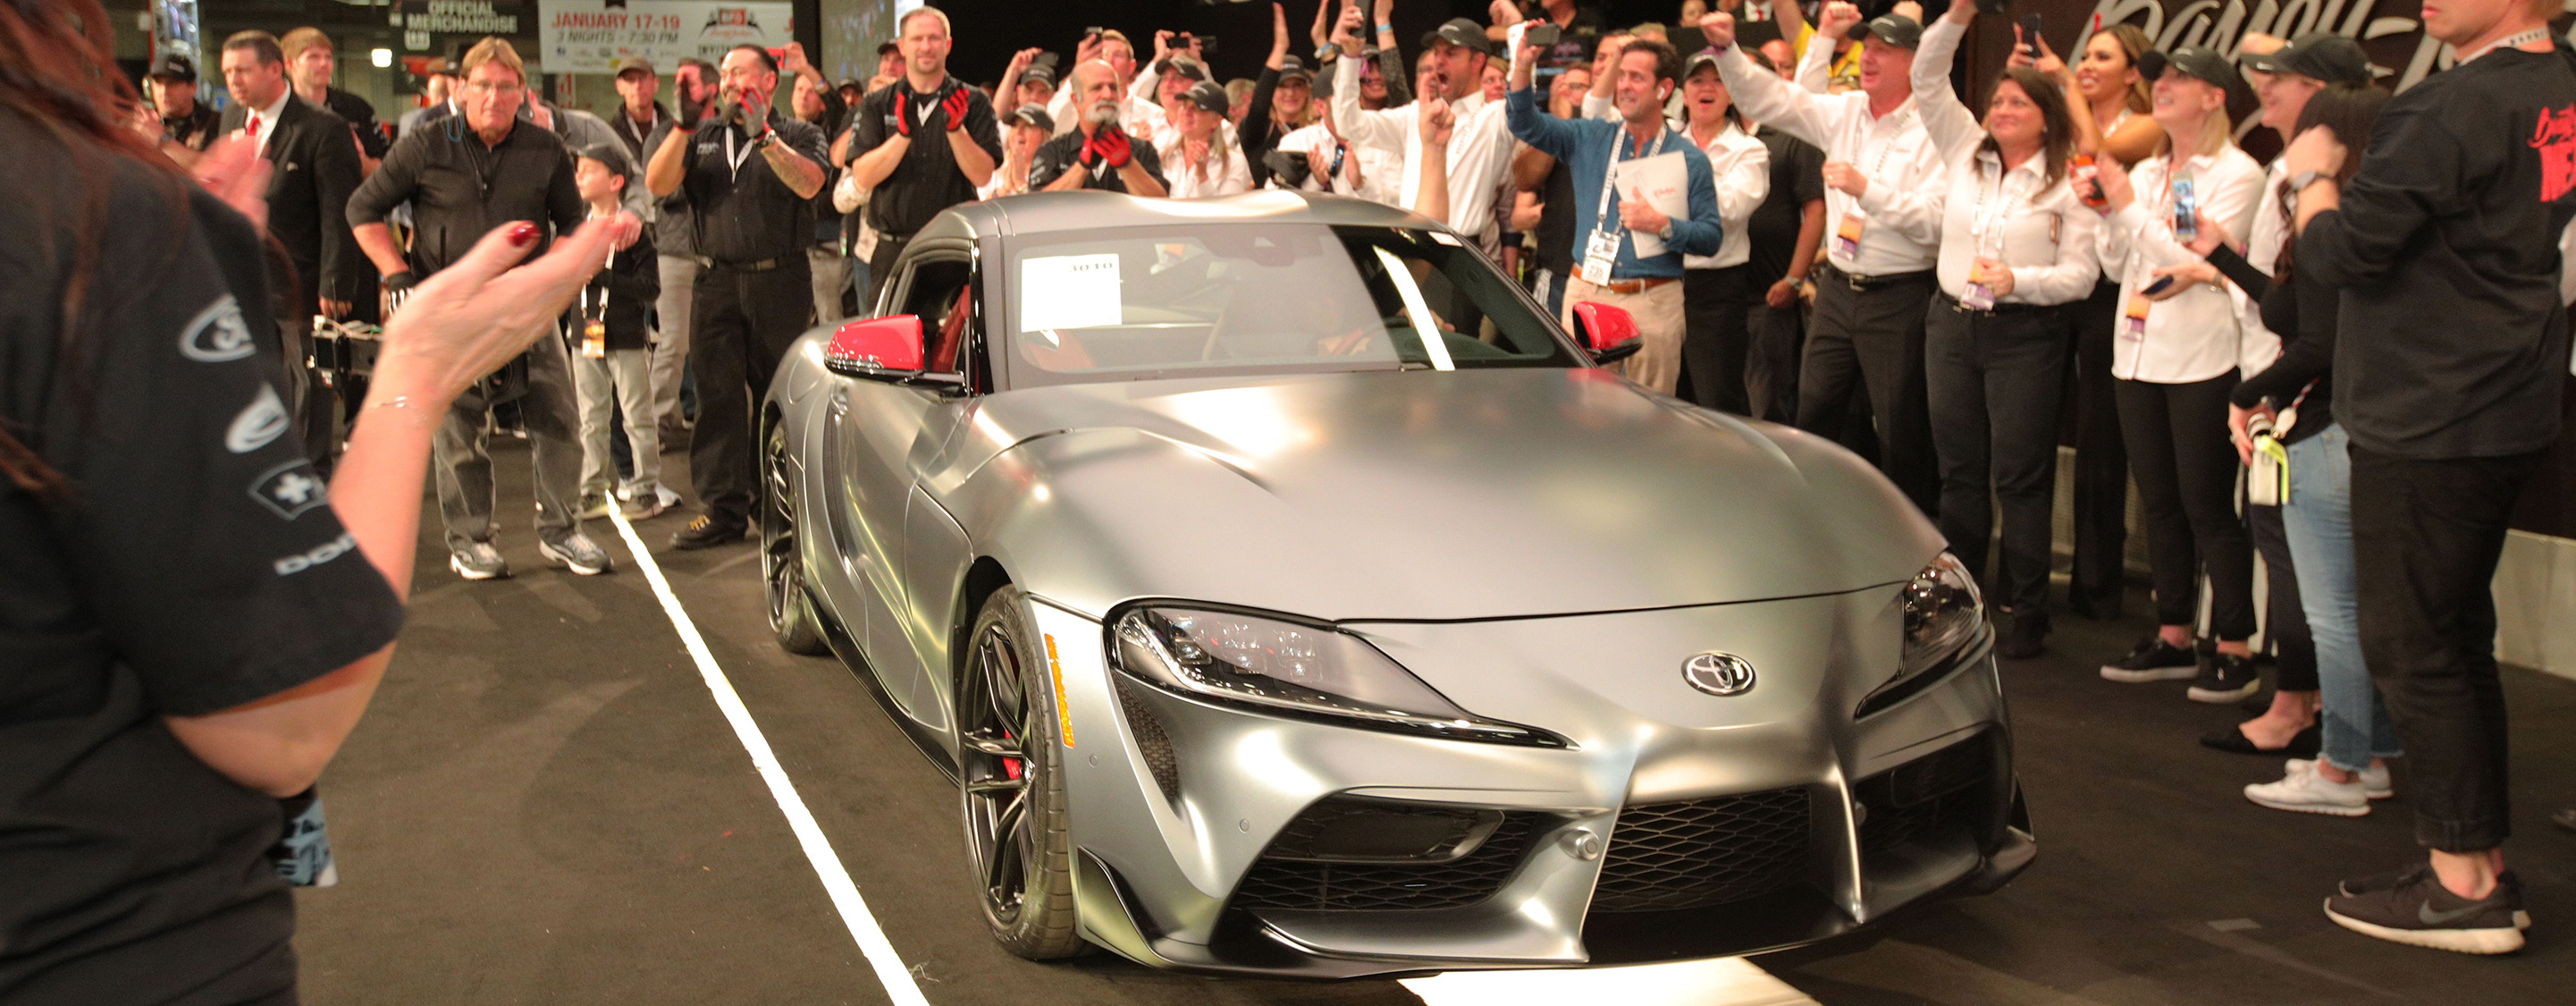 TrackWorthy - 2020 Toyota Supra Auction at Barrett-Jackson Scottsdale (1)